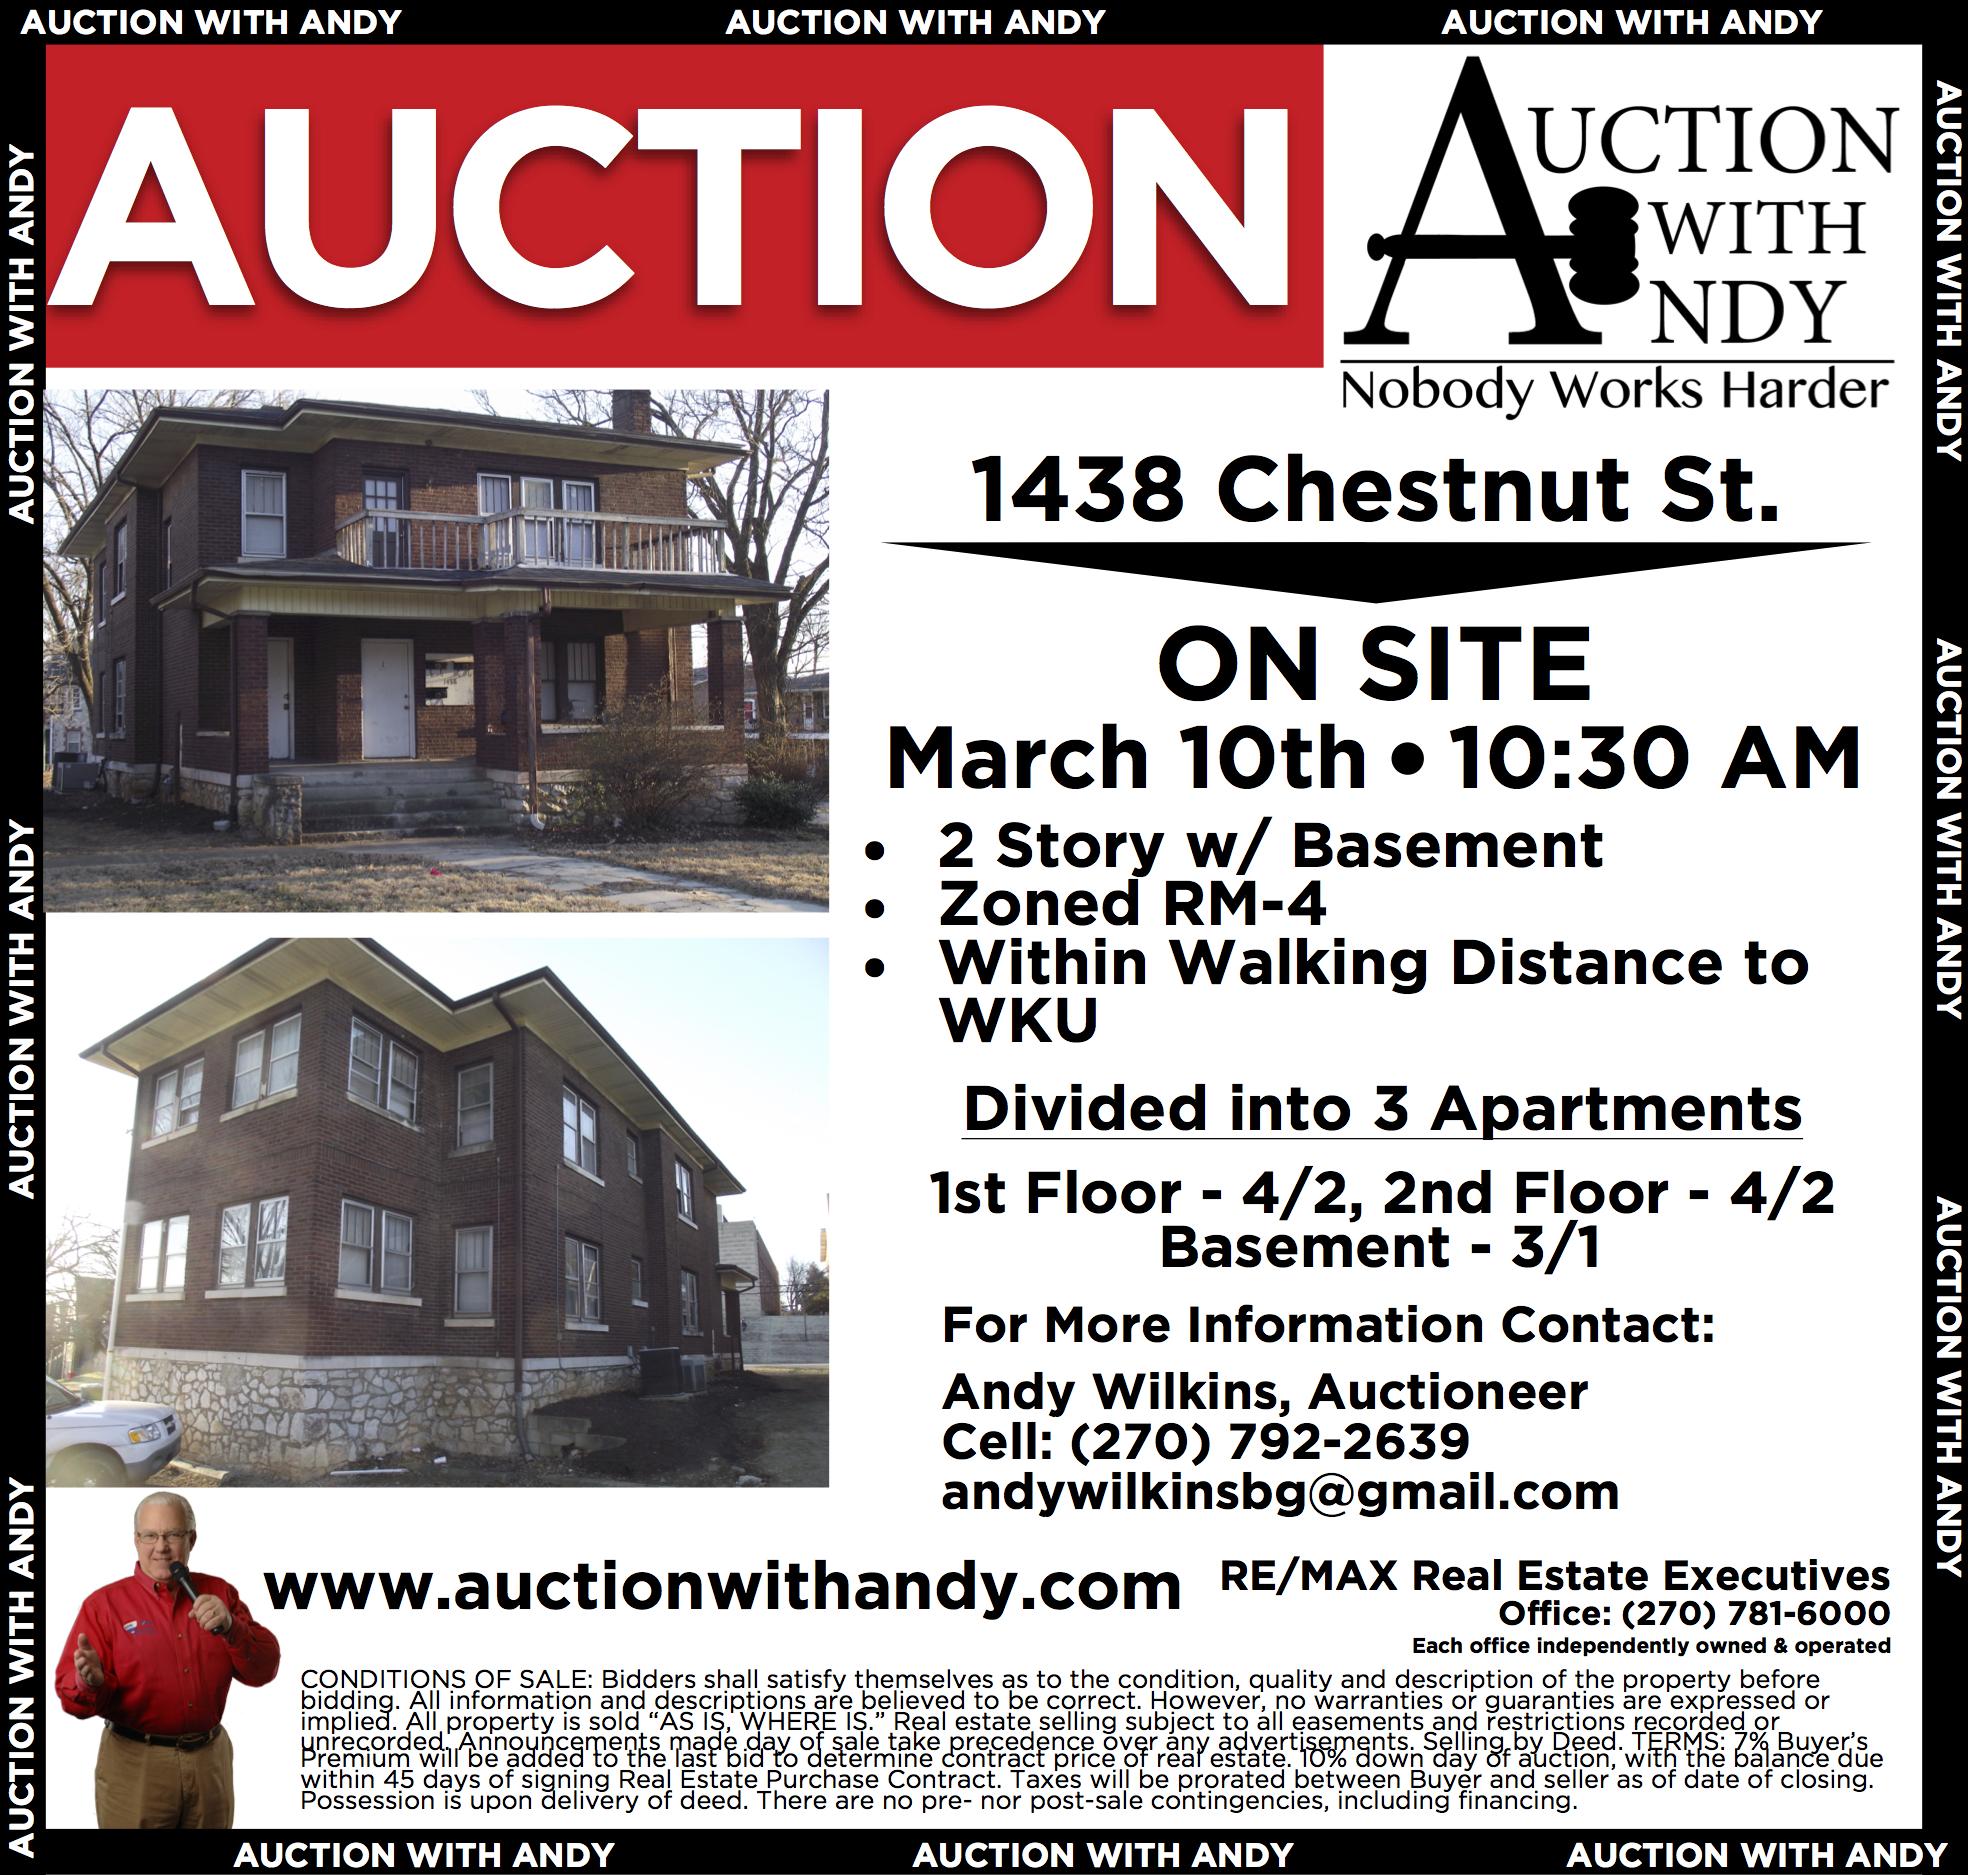 1438 Chestnut St Auction Ad Color.jpg